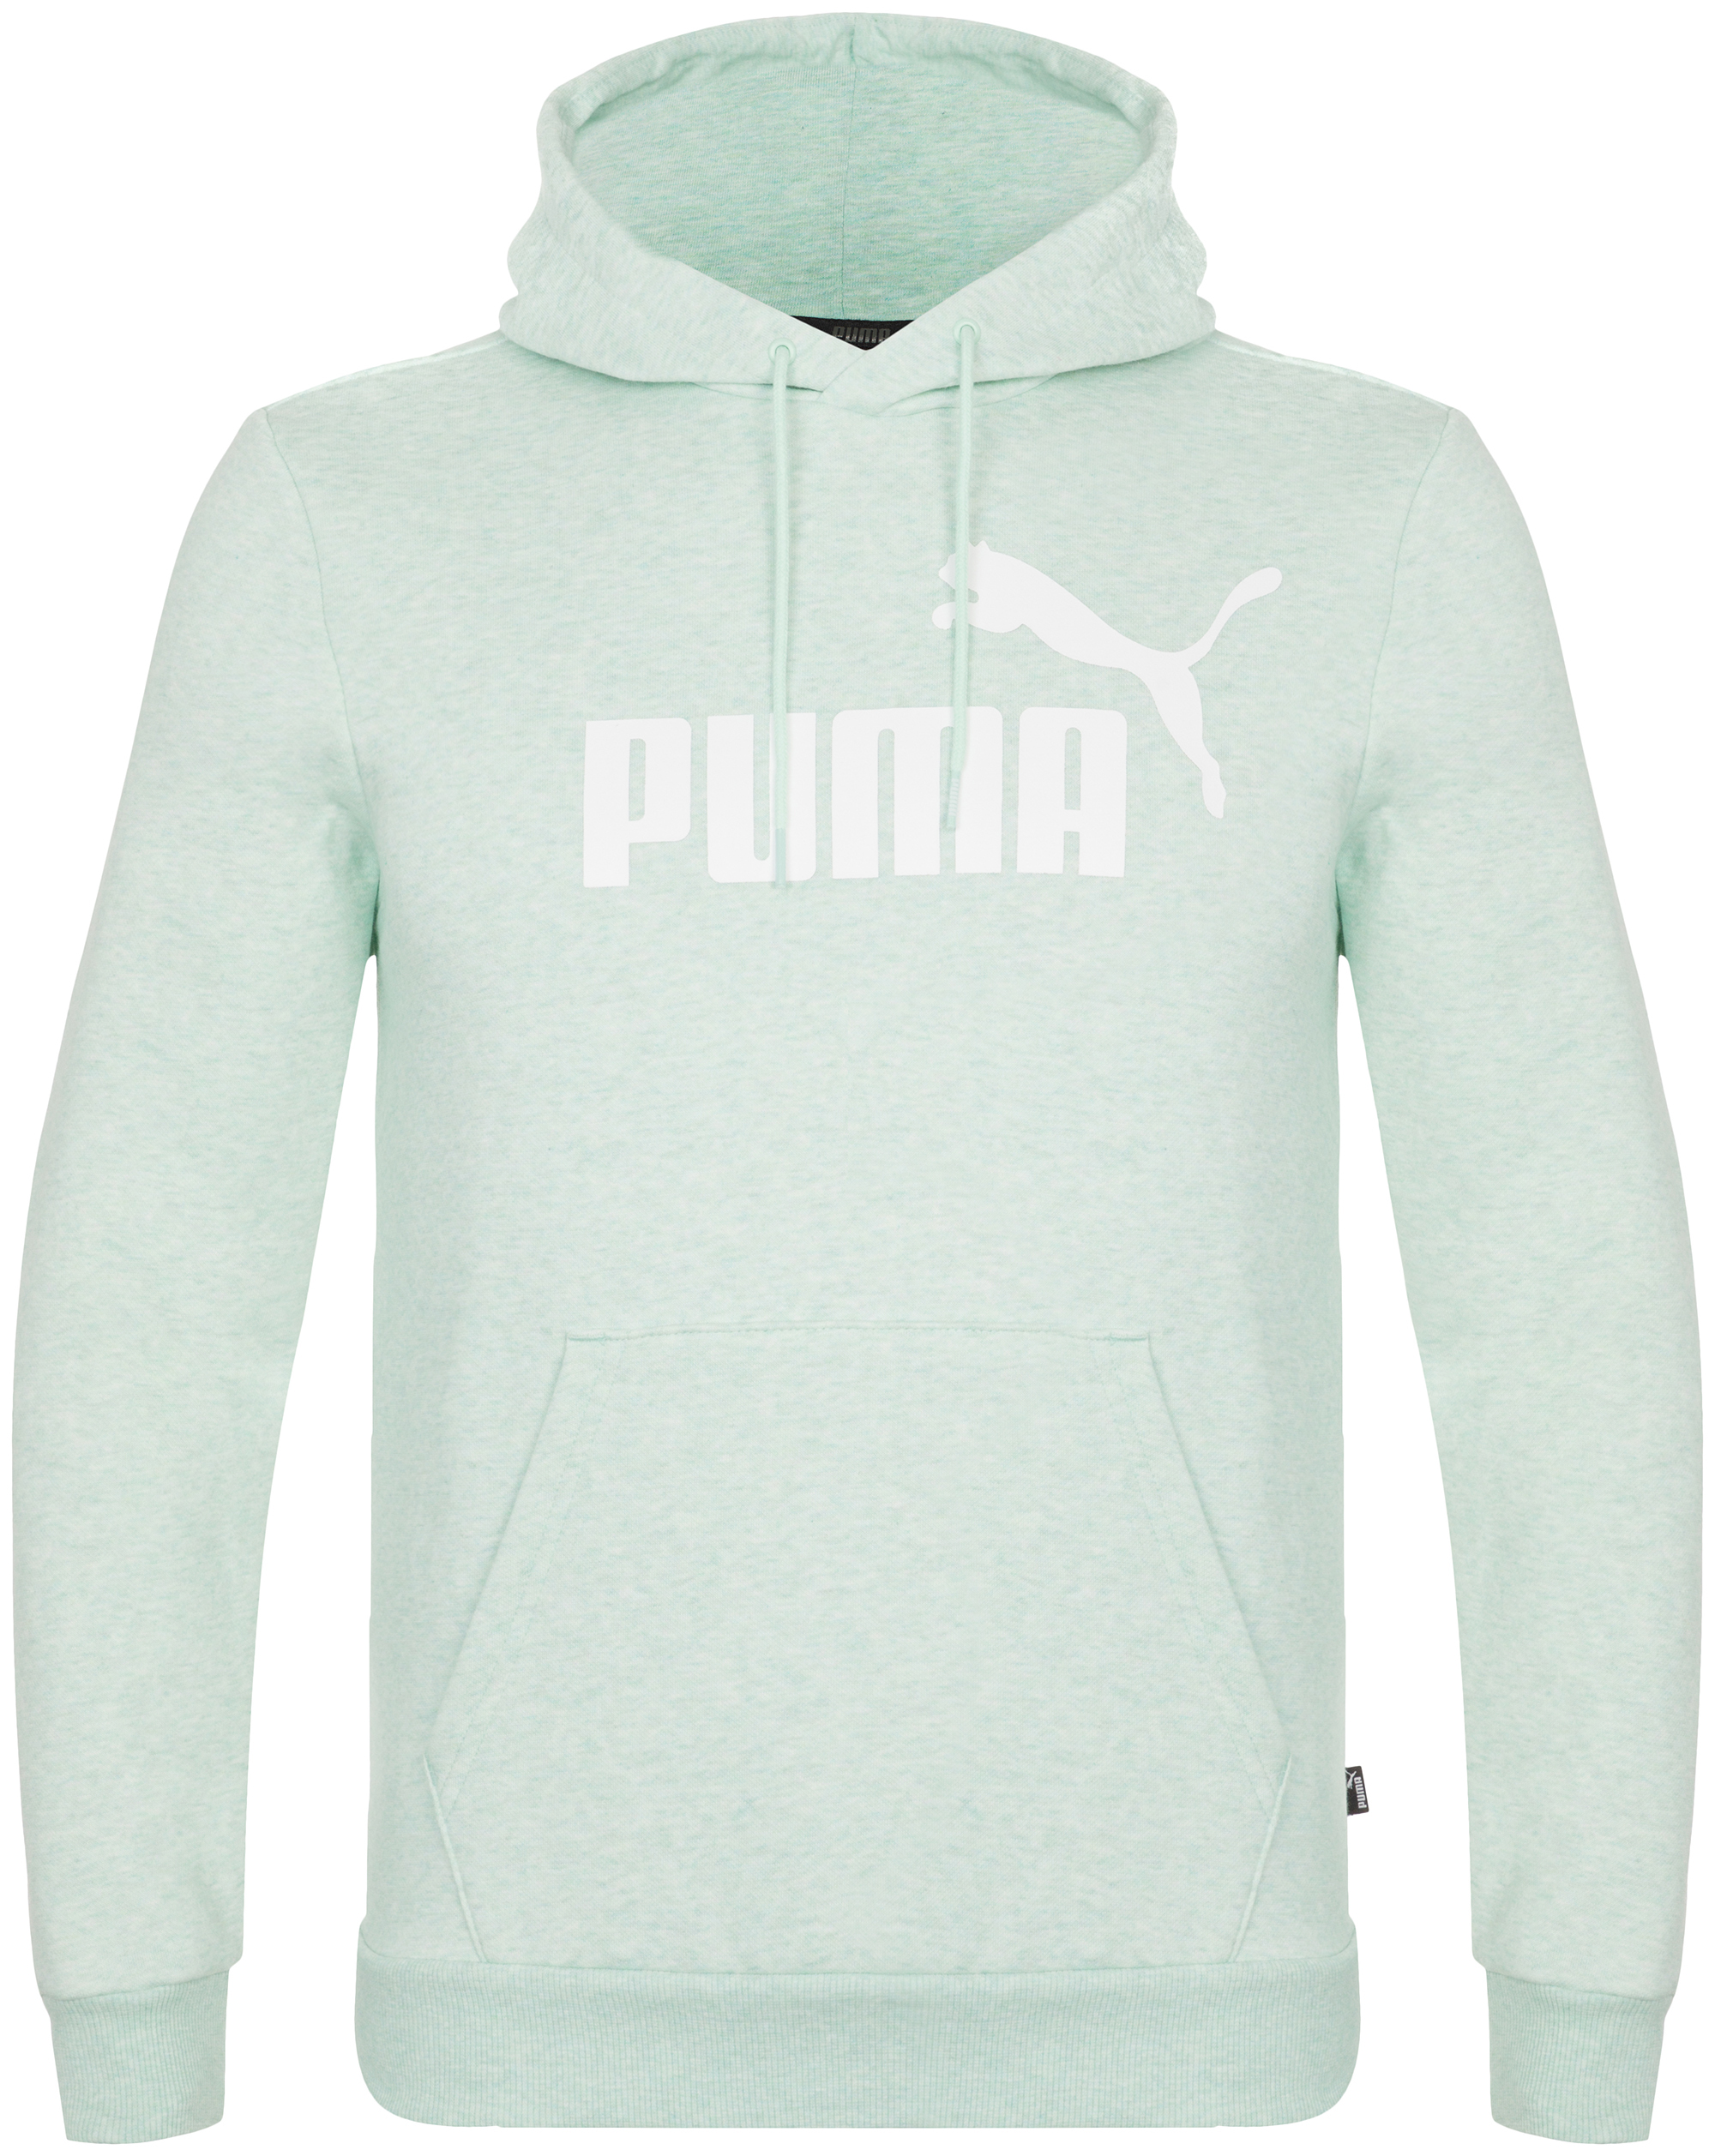 худи женское adidas ess 3s fz hd цвет серый розовый br2438 размер s 42 44 Puma Худи мужская Puma ESS+ Hoody FL, размер 44-46